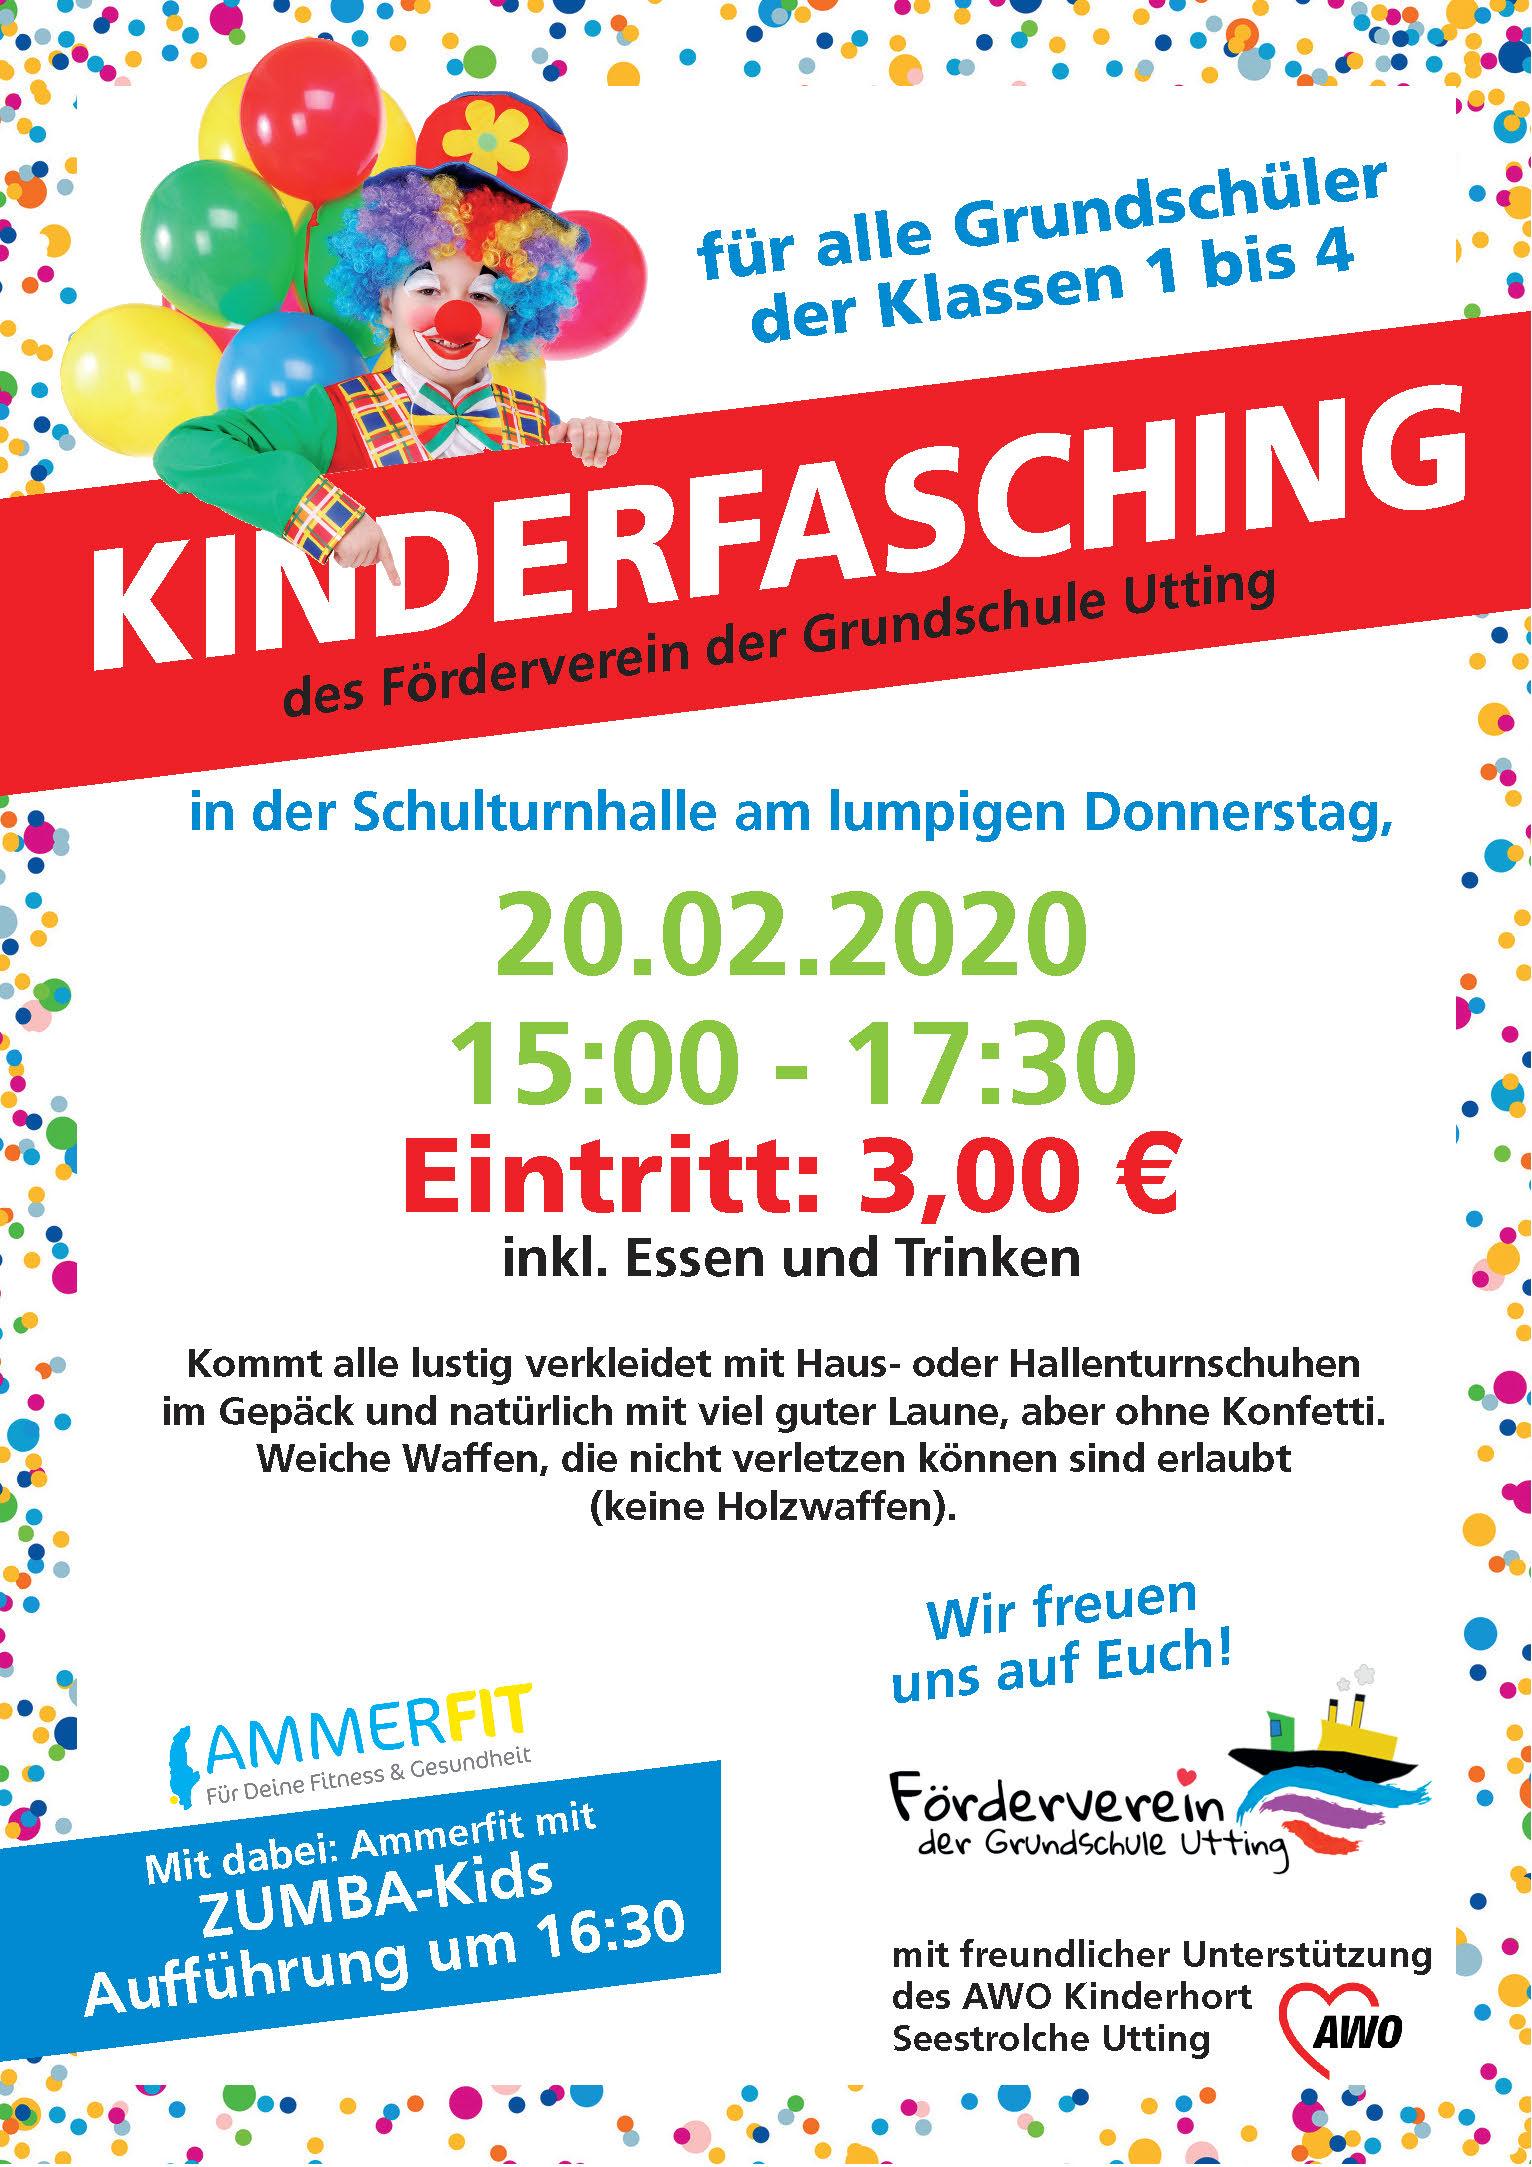 Kinderfasching am 20.02.2020